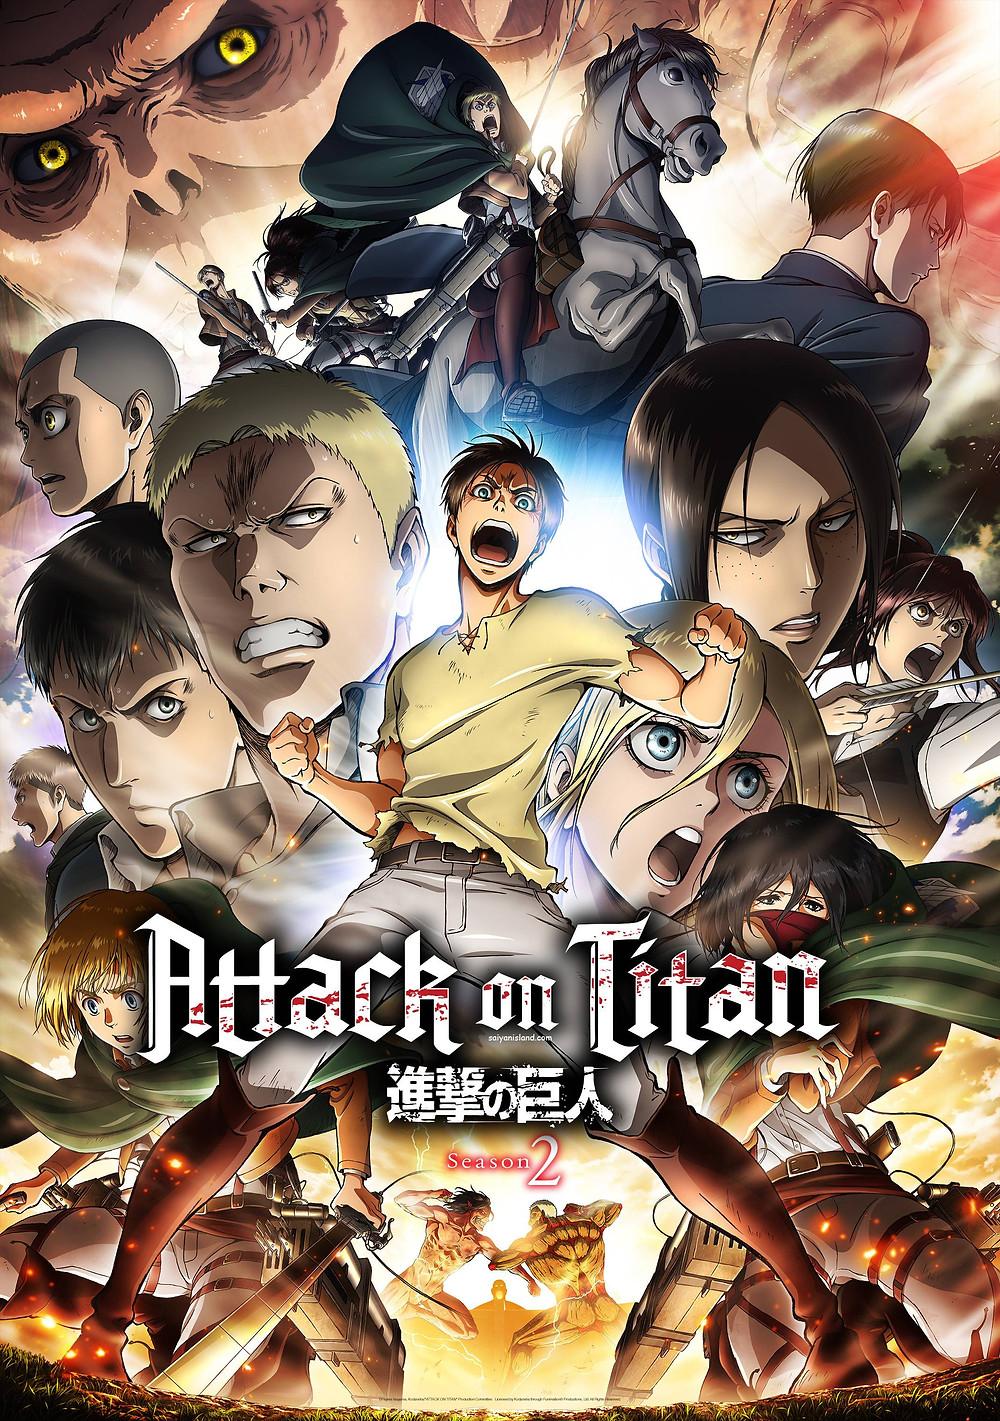 Attack On Titan Season 2 Key Visual